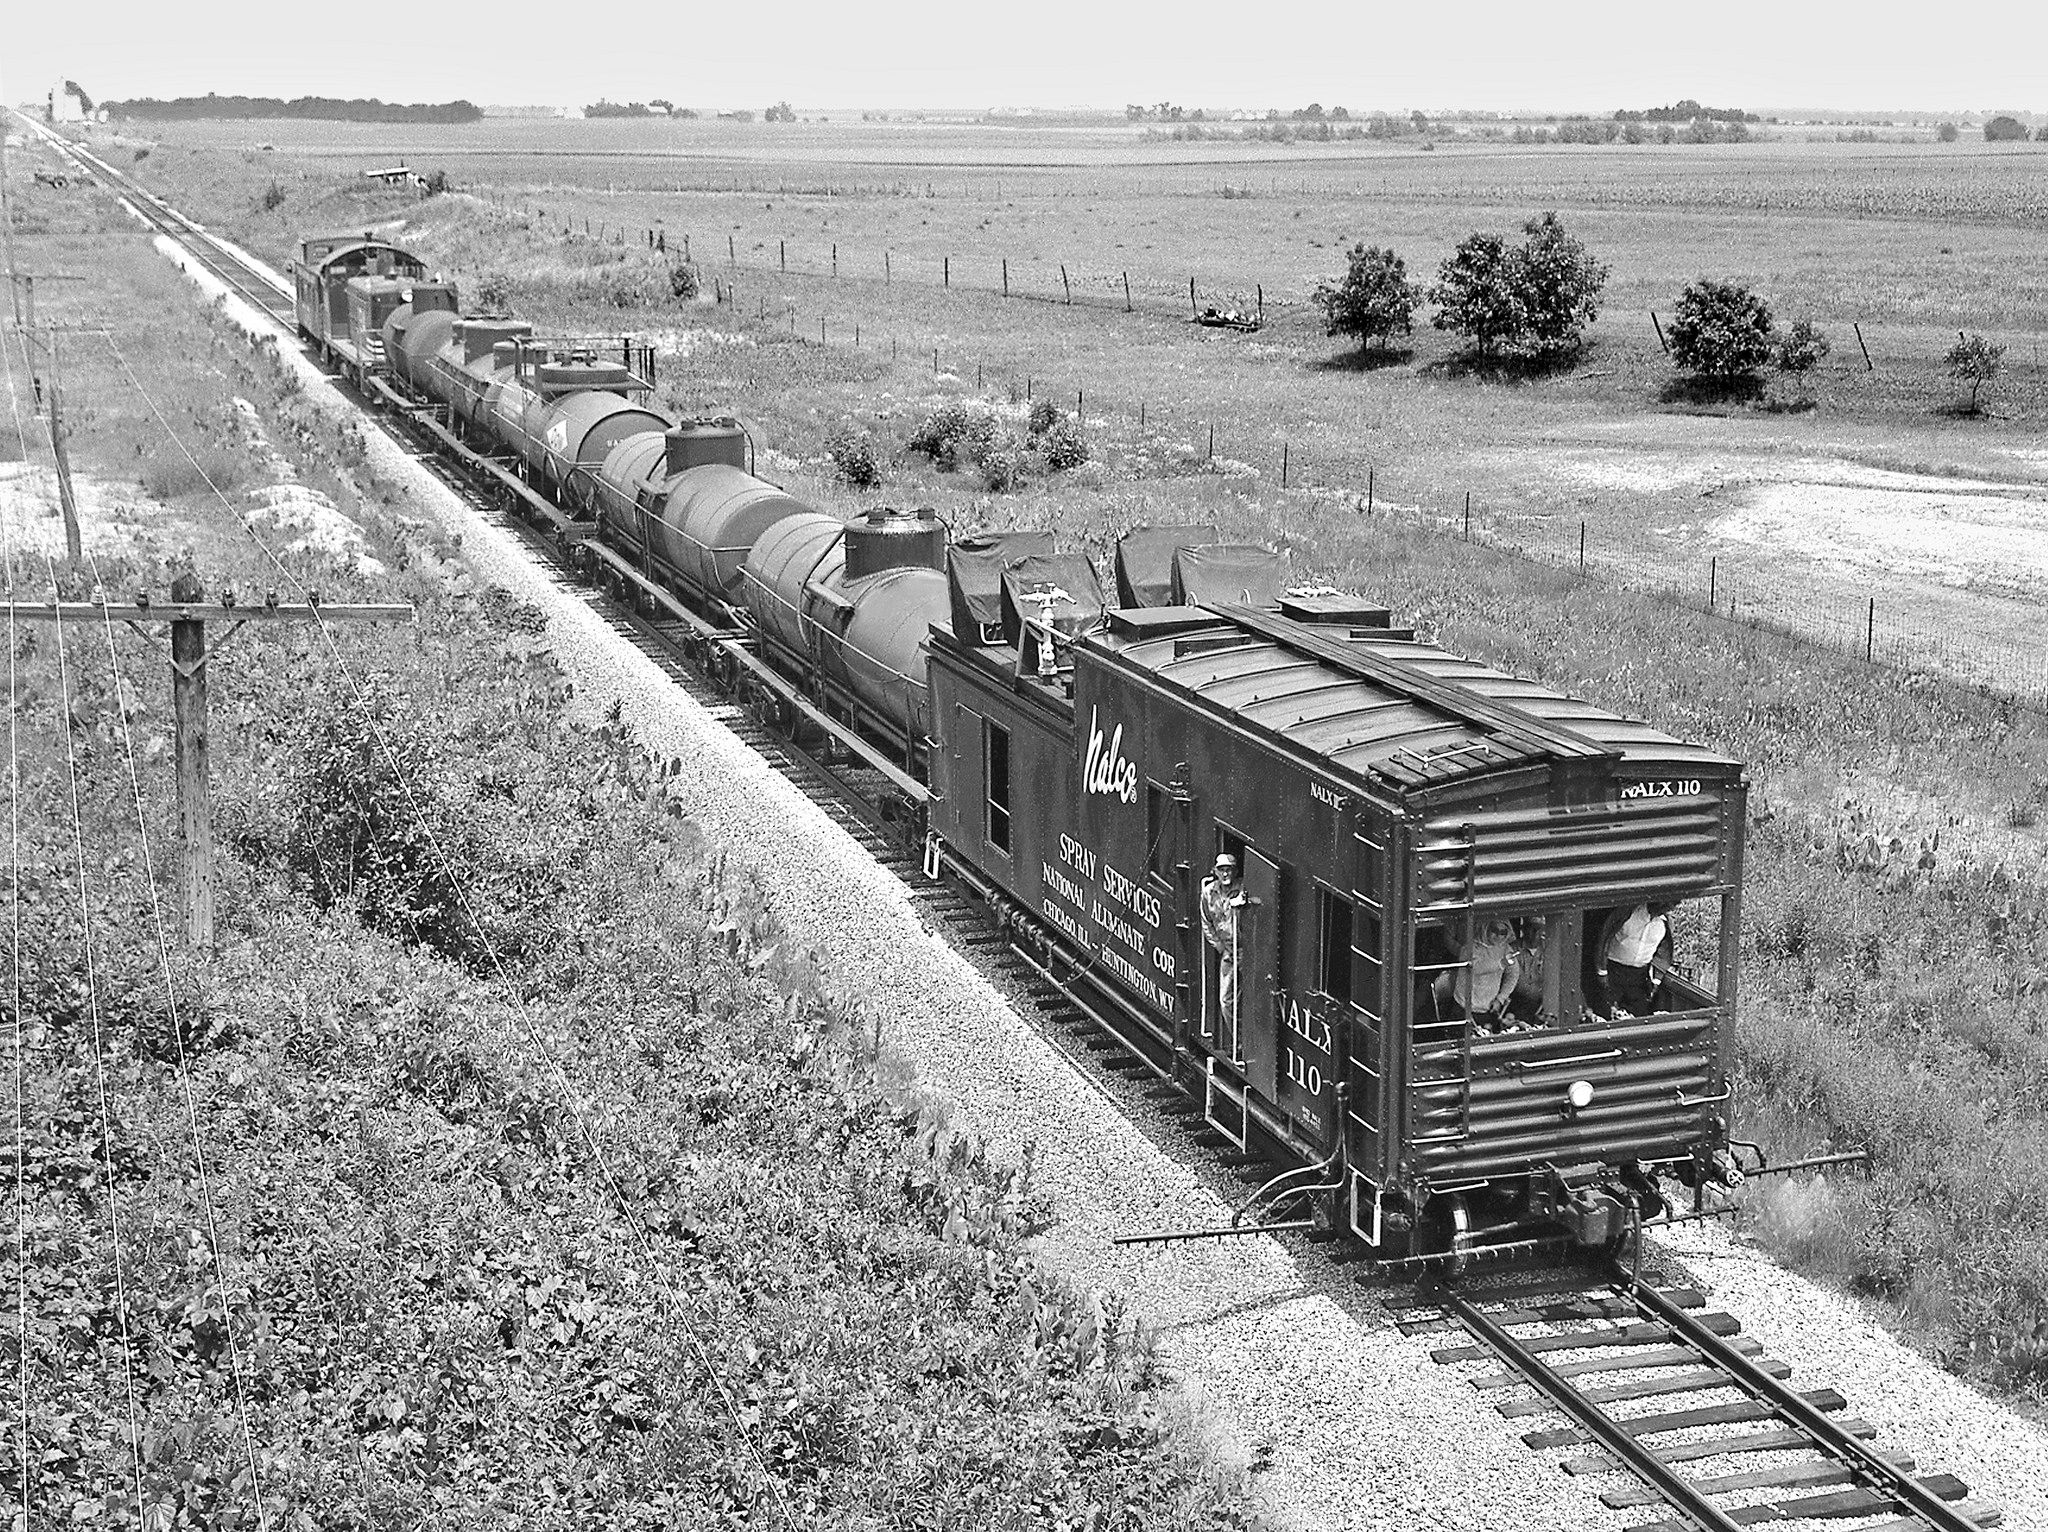 C&EI, Glover, Illinois, 1959 Chicago & Eastern Illinois Railroad ...